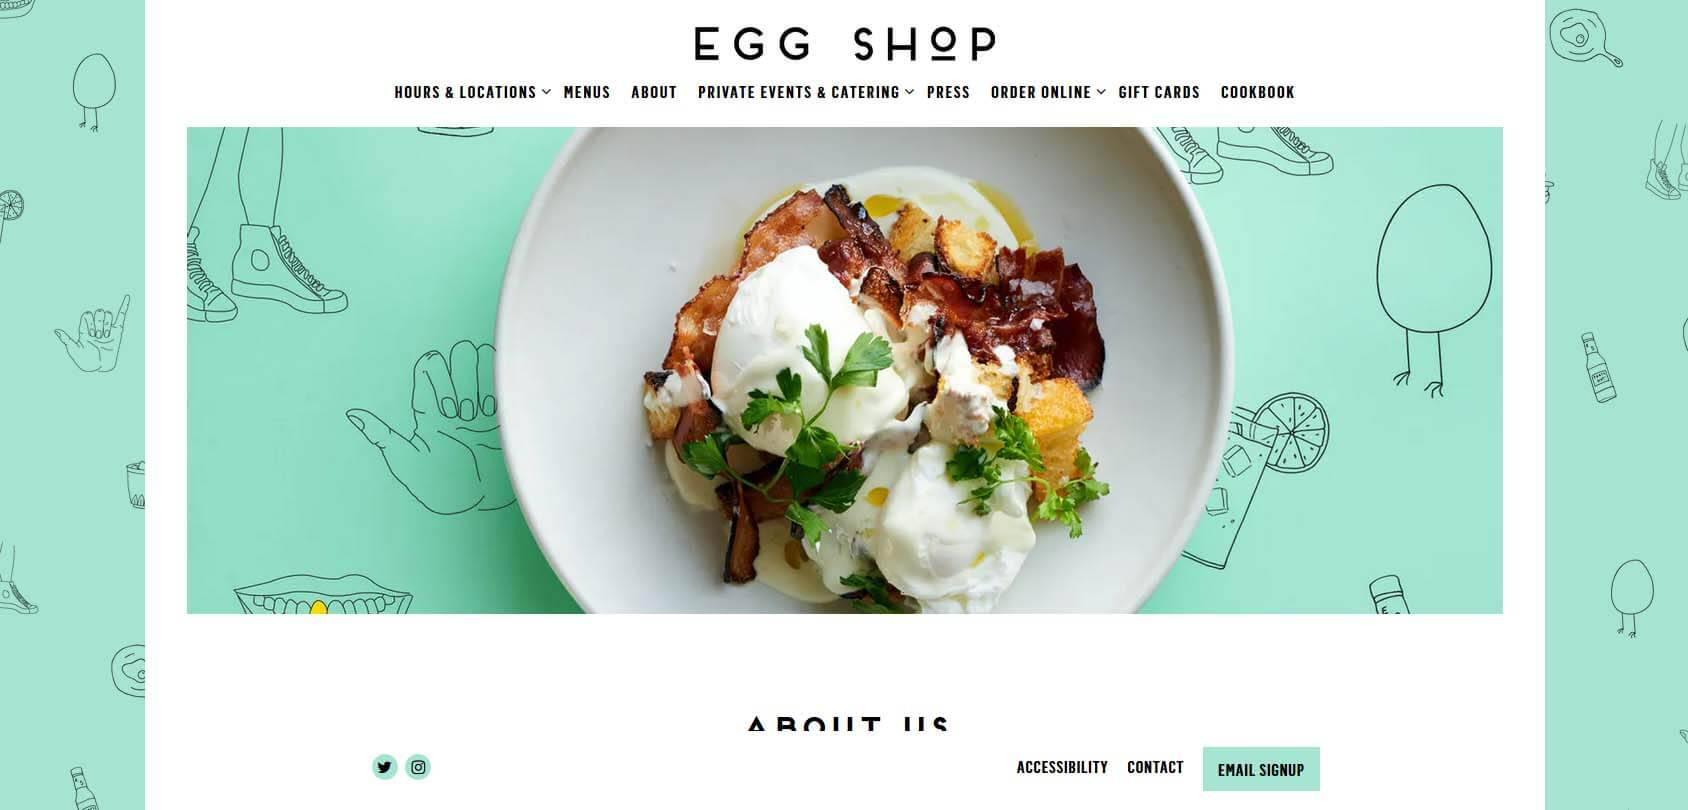 Egg Shop Homepage